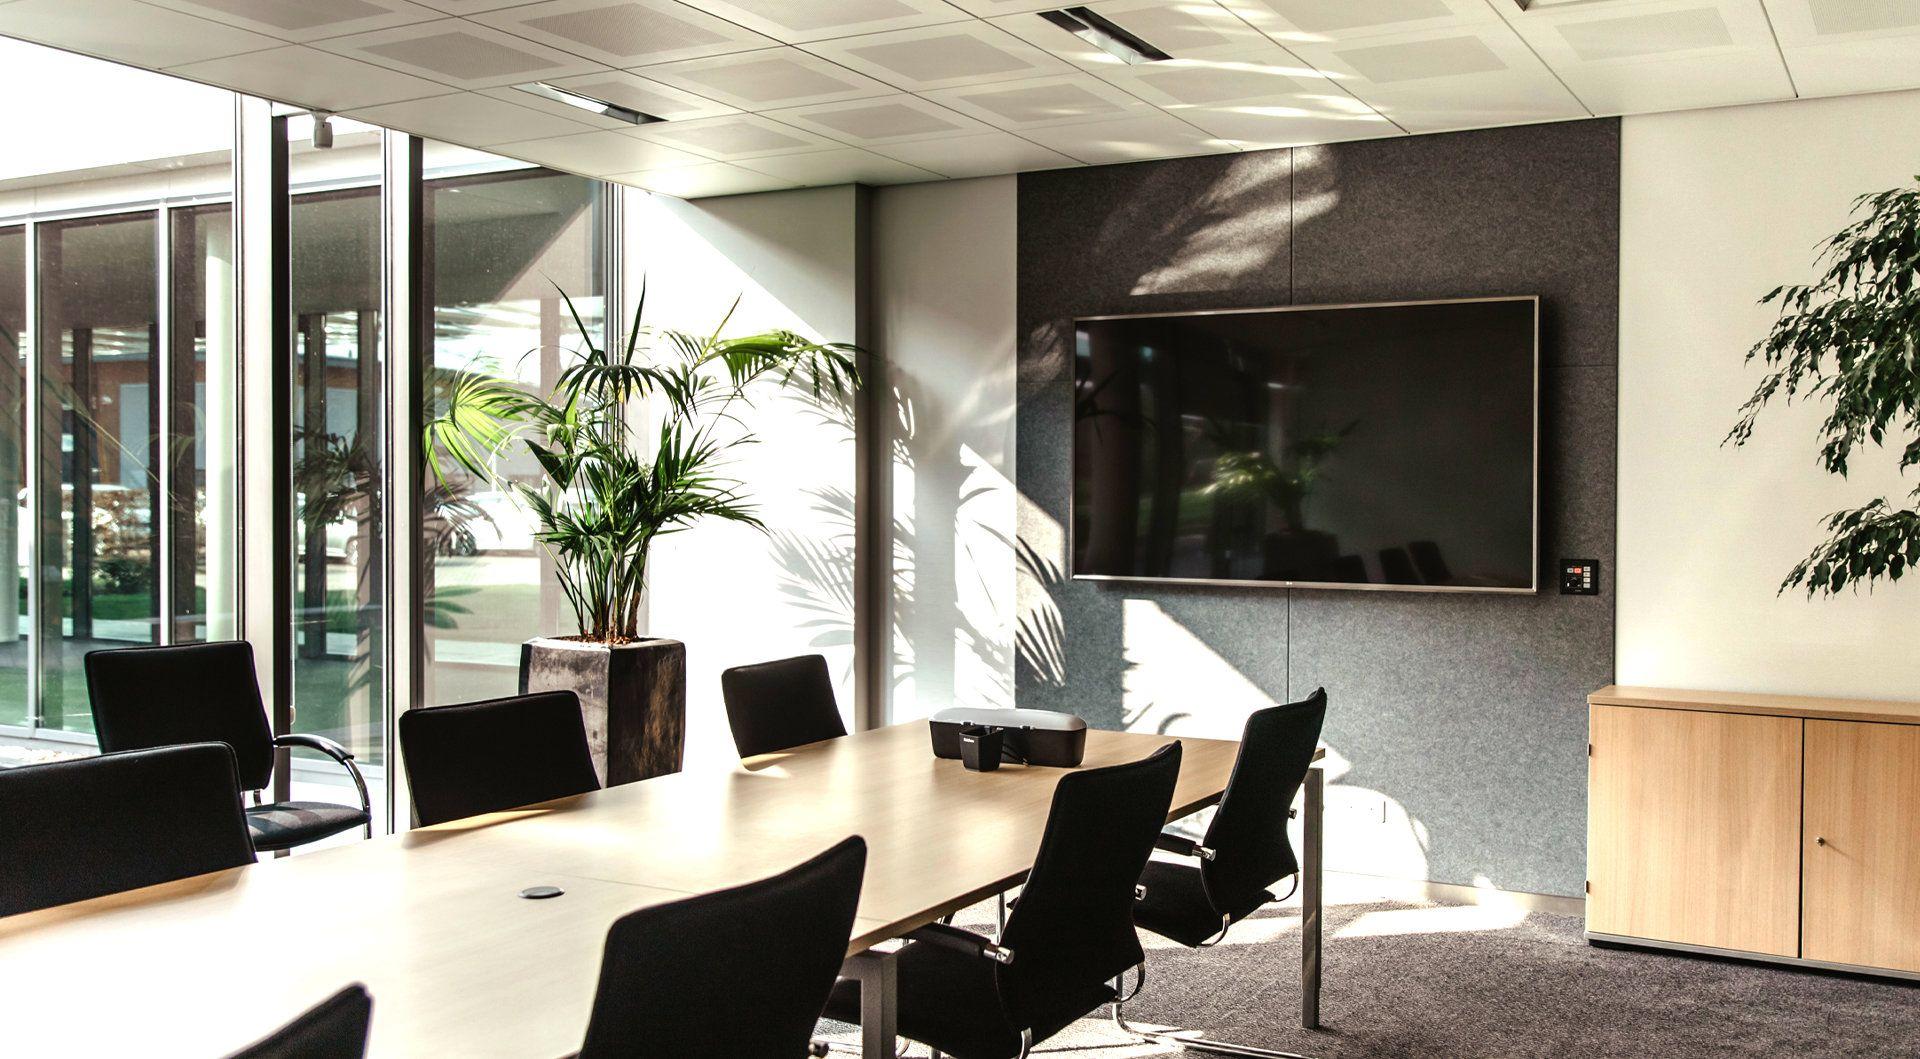 "LG 75UM3E beeldkrant 190,5 cm (75"") LED 4K Ultra HD Digitale signage flatscreen Zwart - Case studie de vries"